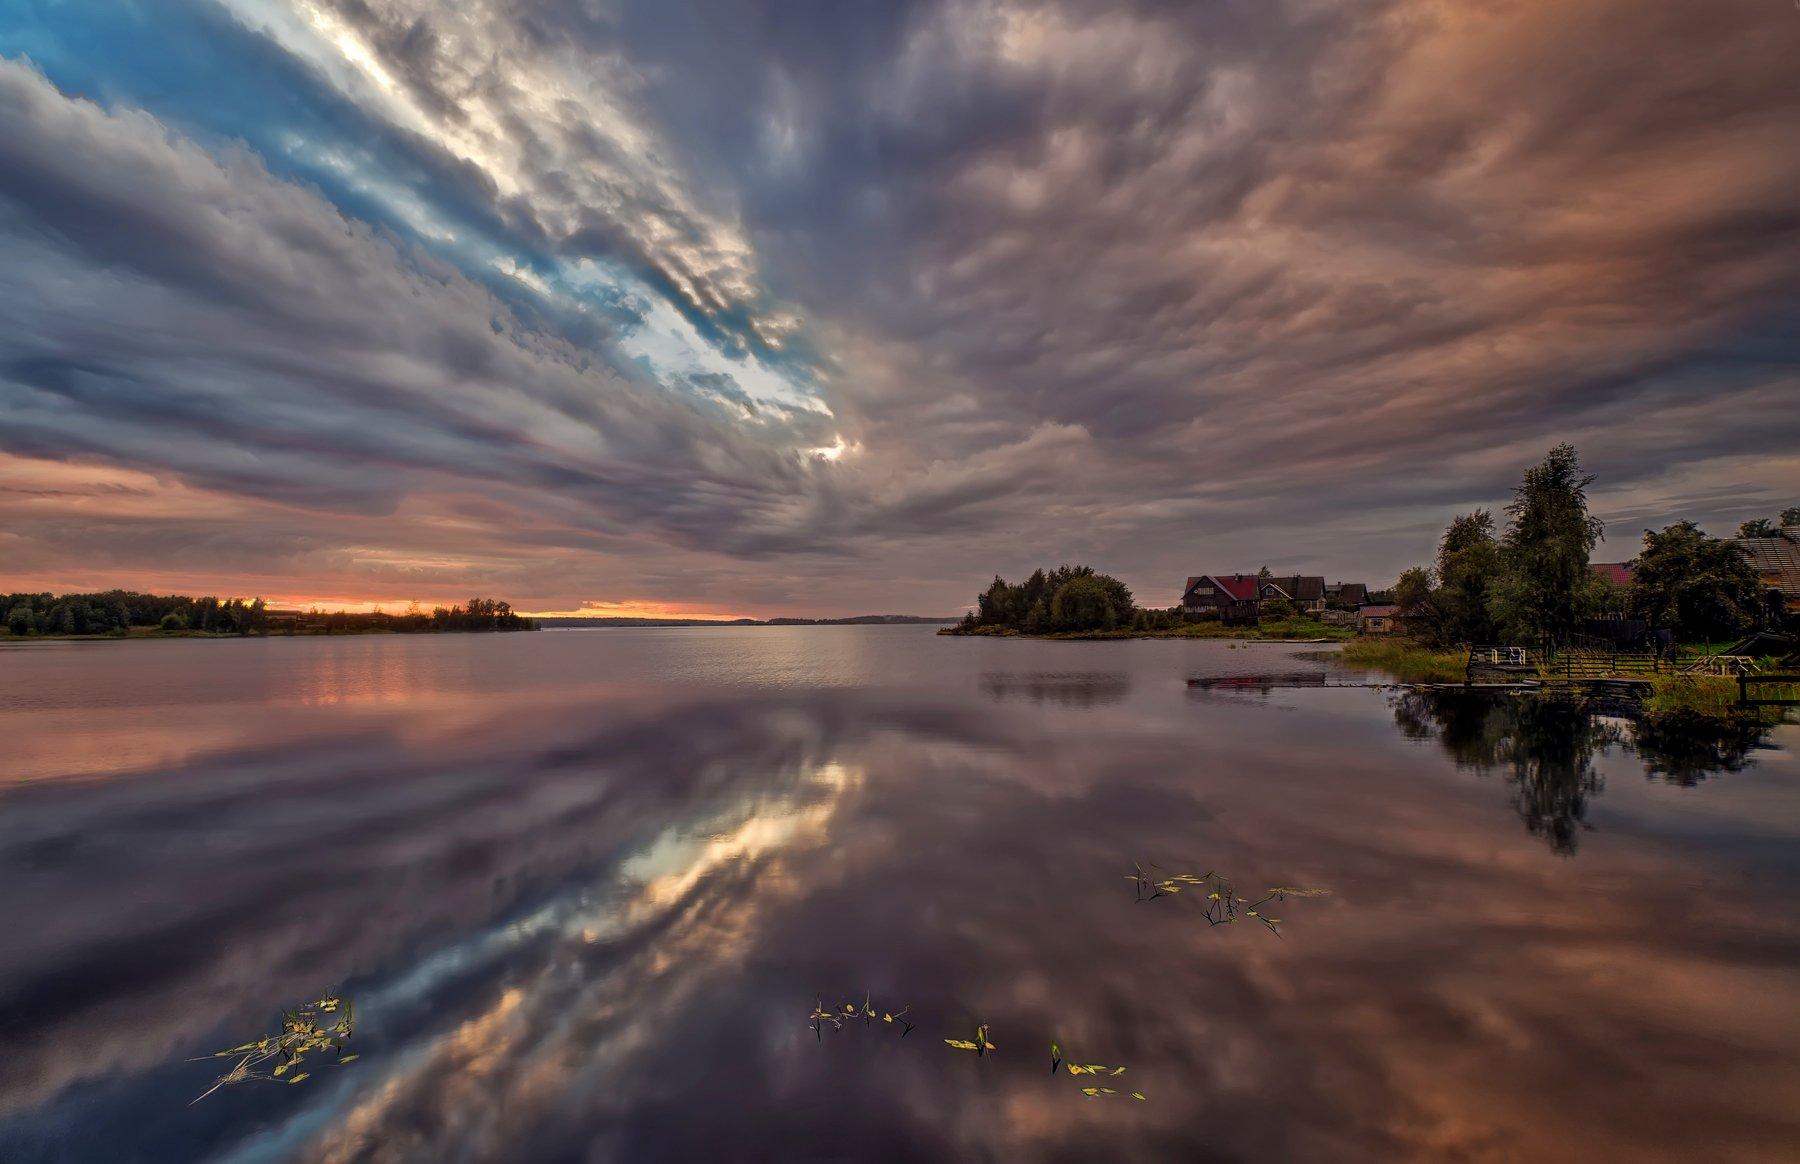 пейзаж,озеро,вечер,закат,деревня, Тамара